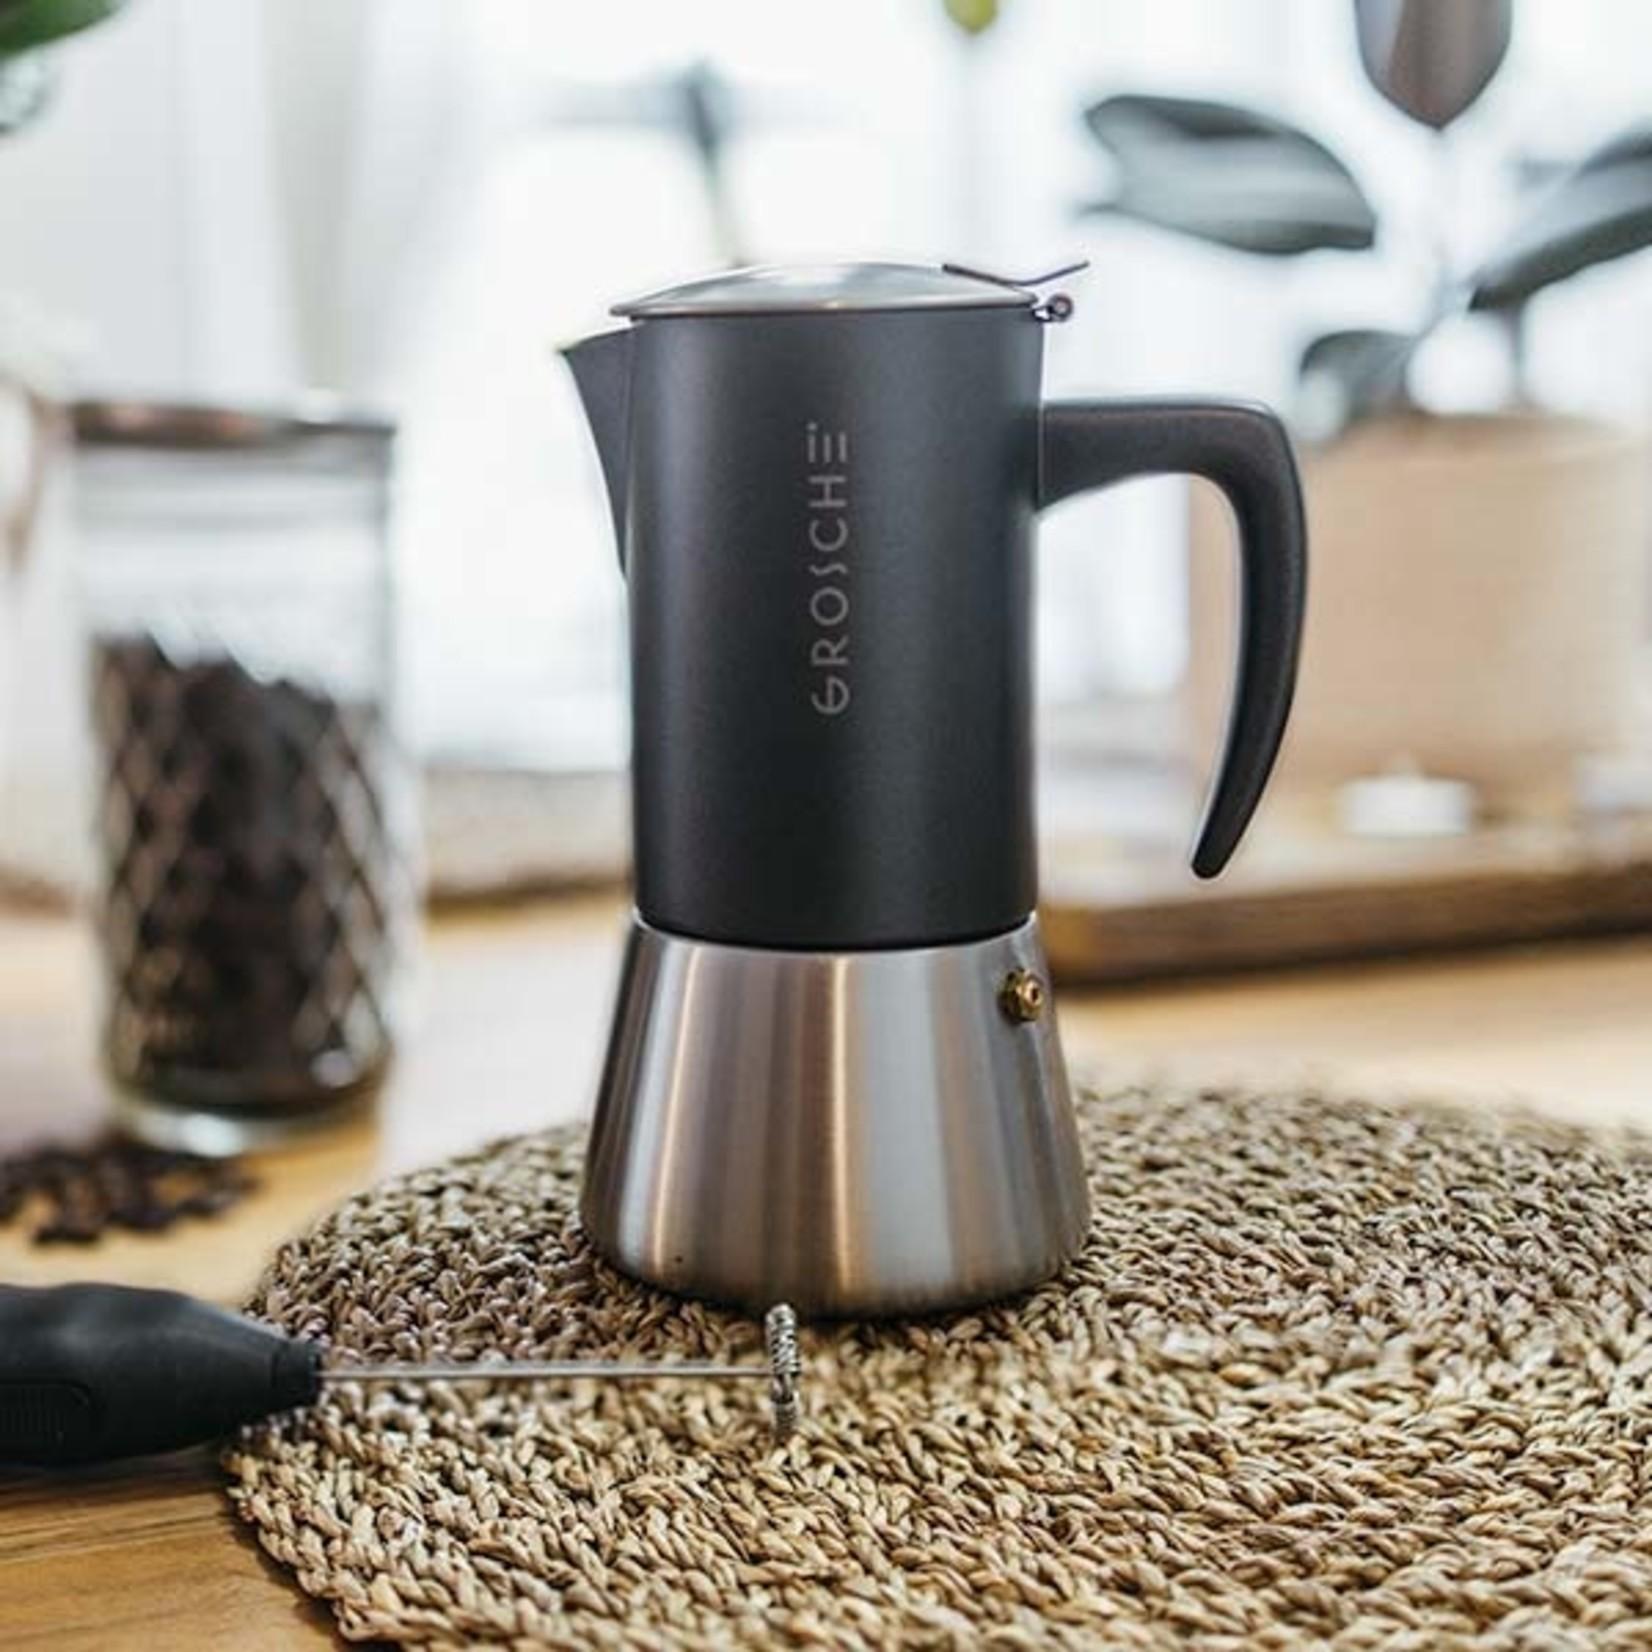 Grosche Milano Stainless Steel Stovetop Espresso Maker